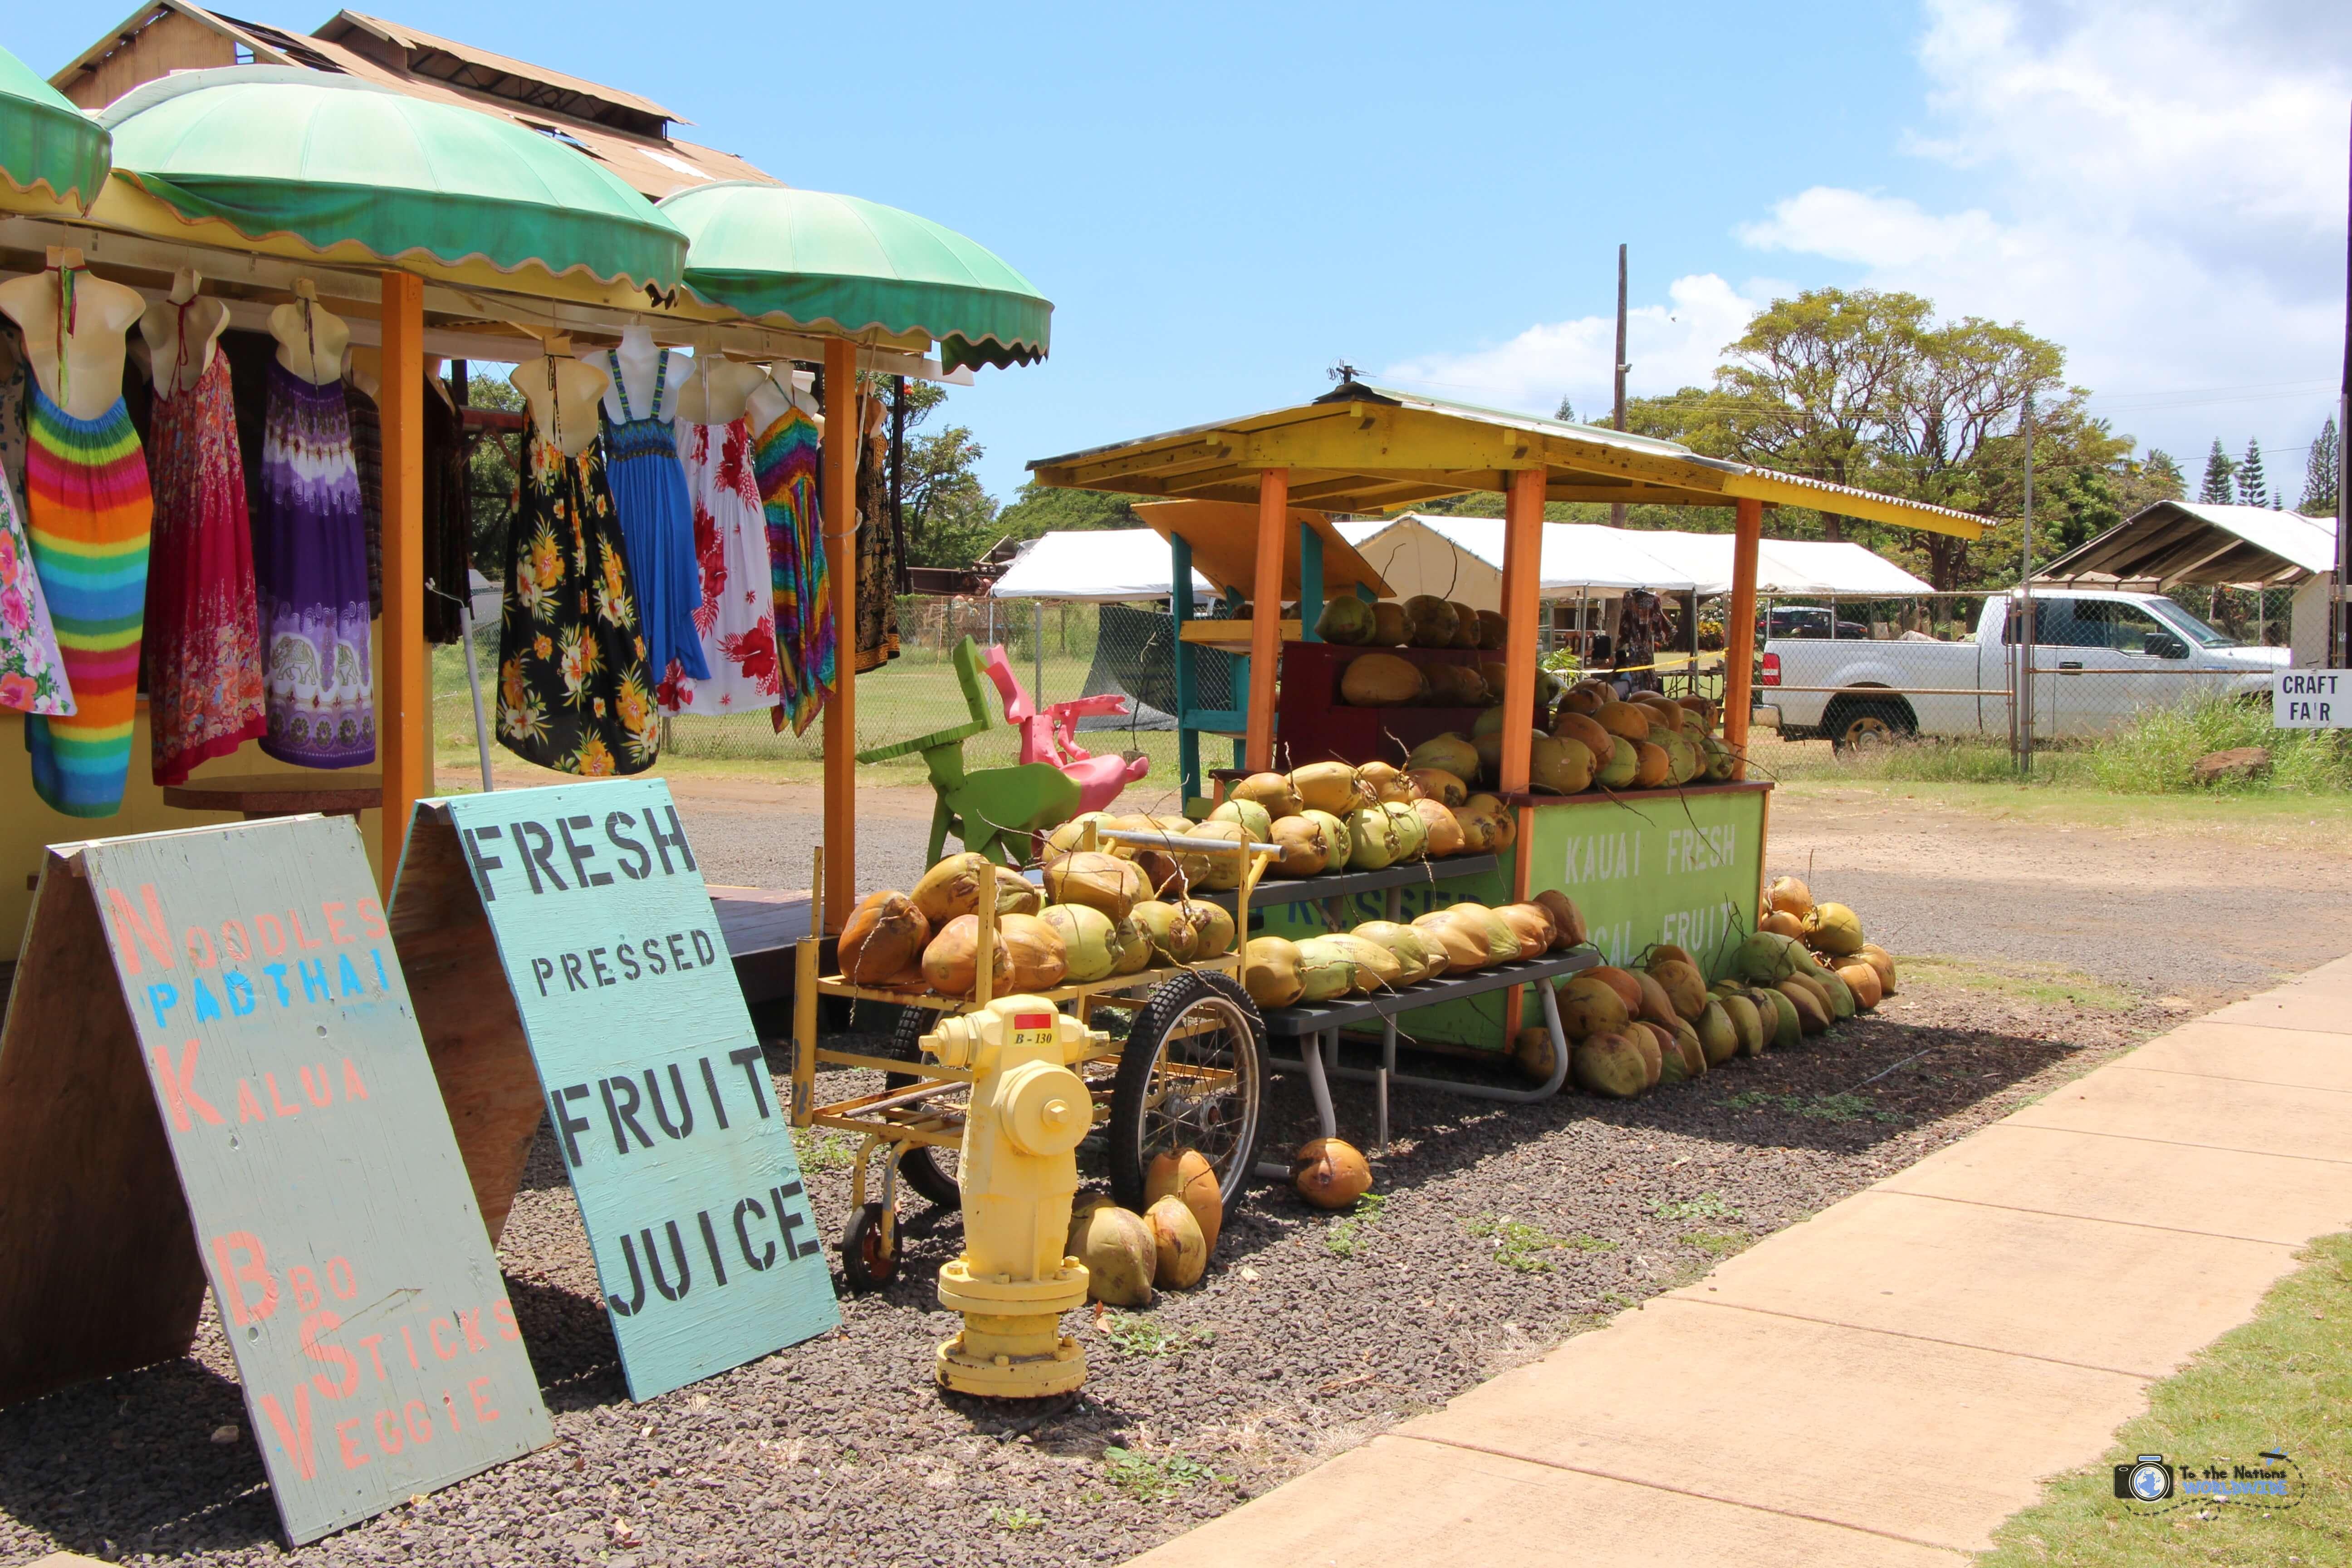 Fruit Vendor on Kauai Island, Hawaii